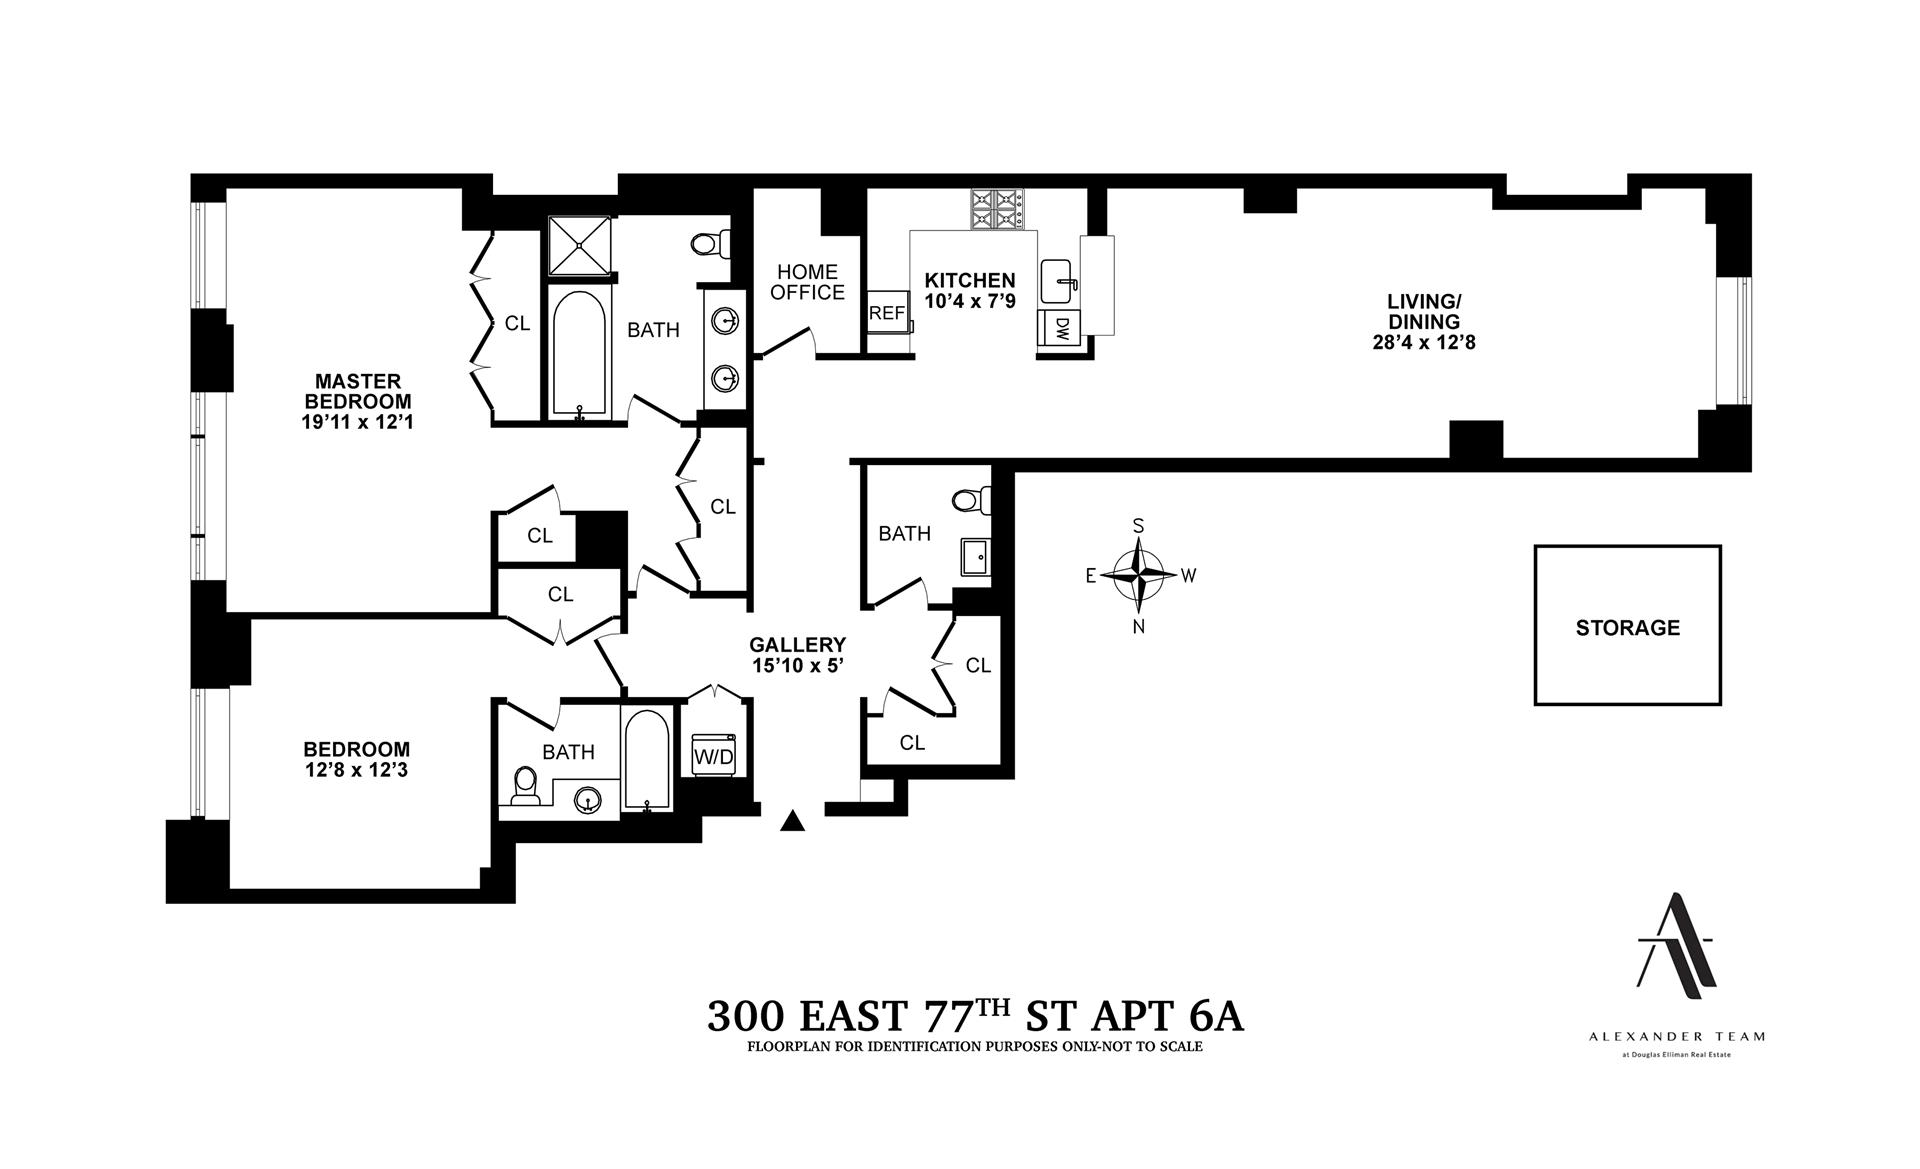 Floor plan of THE SEVILLE, 300 East 77th Street, 6A - Upper East Side, New York